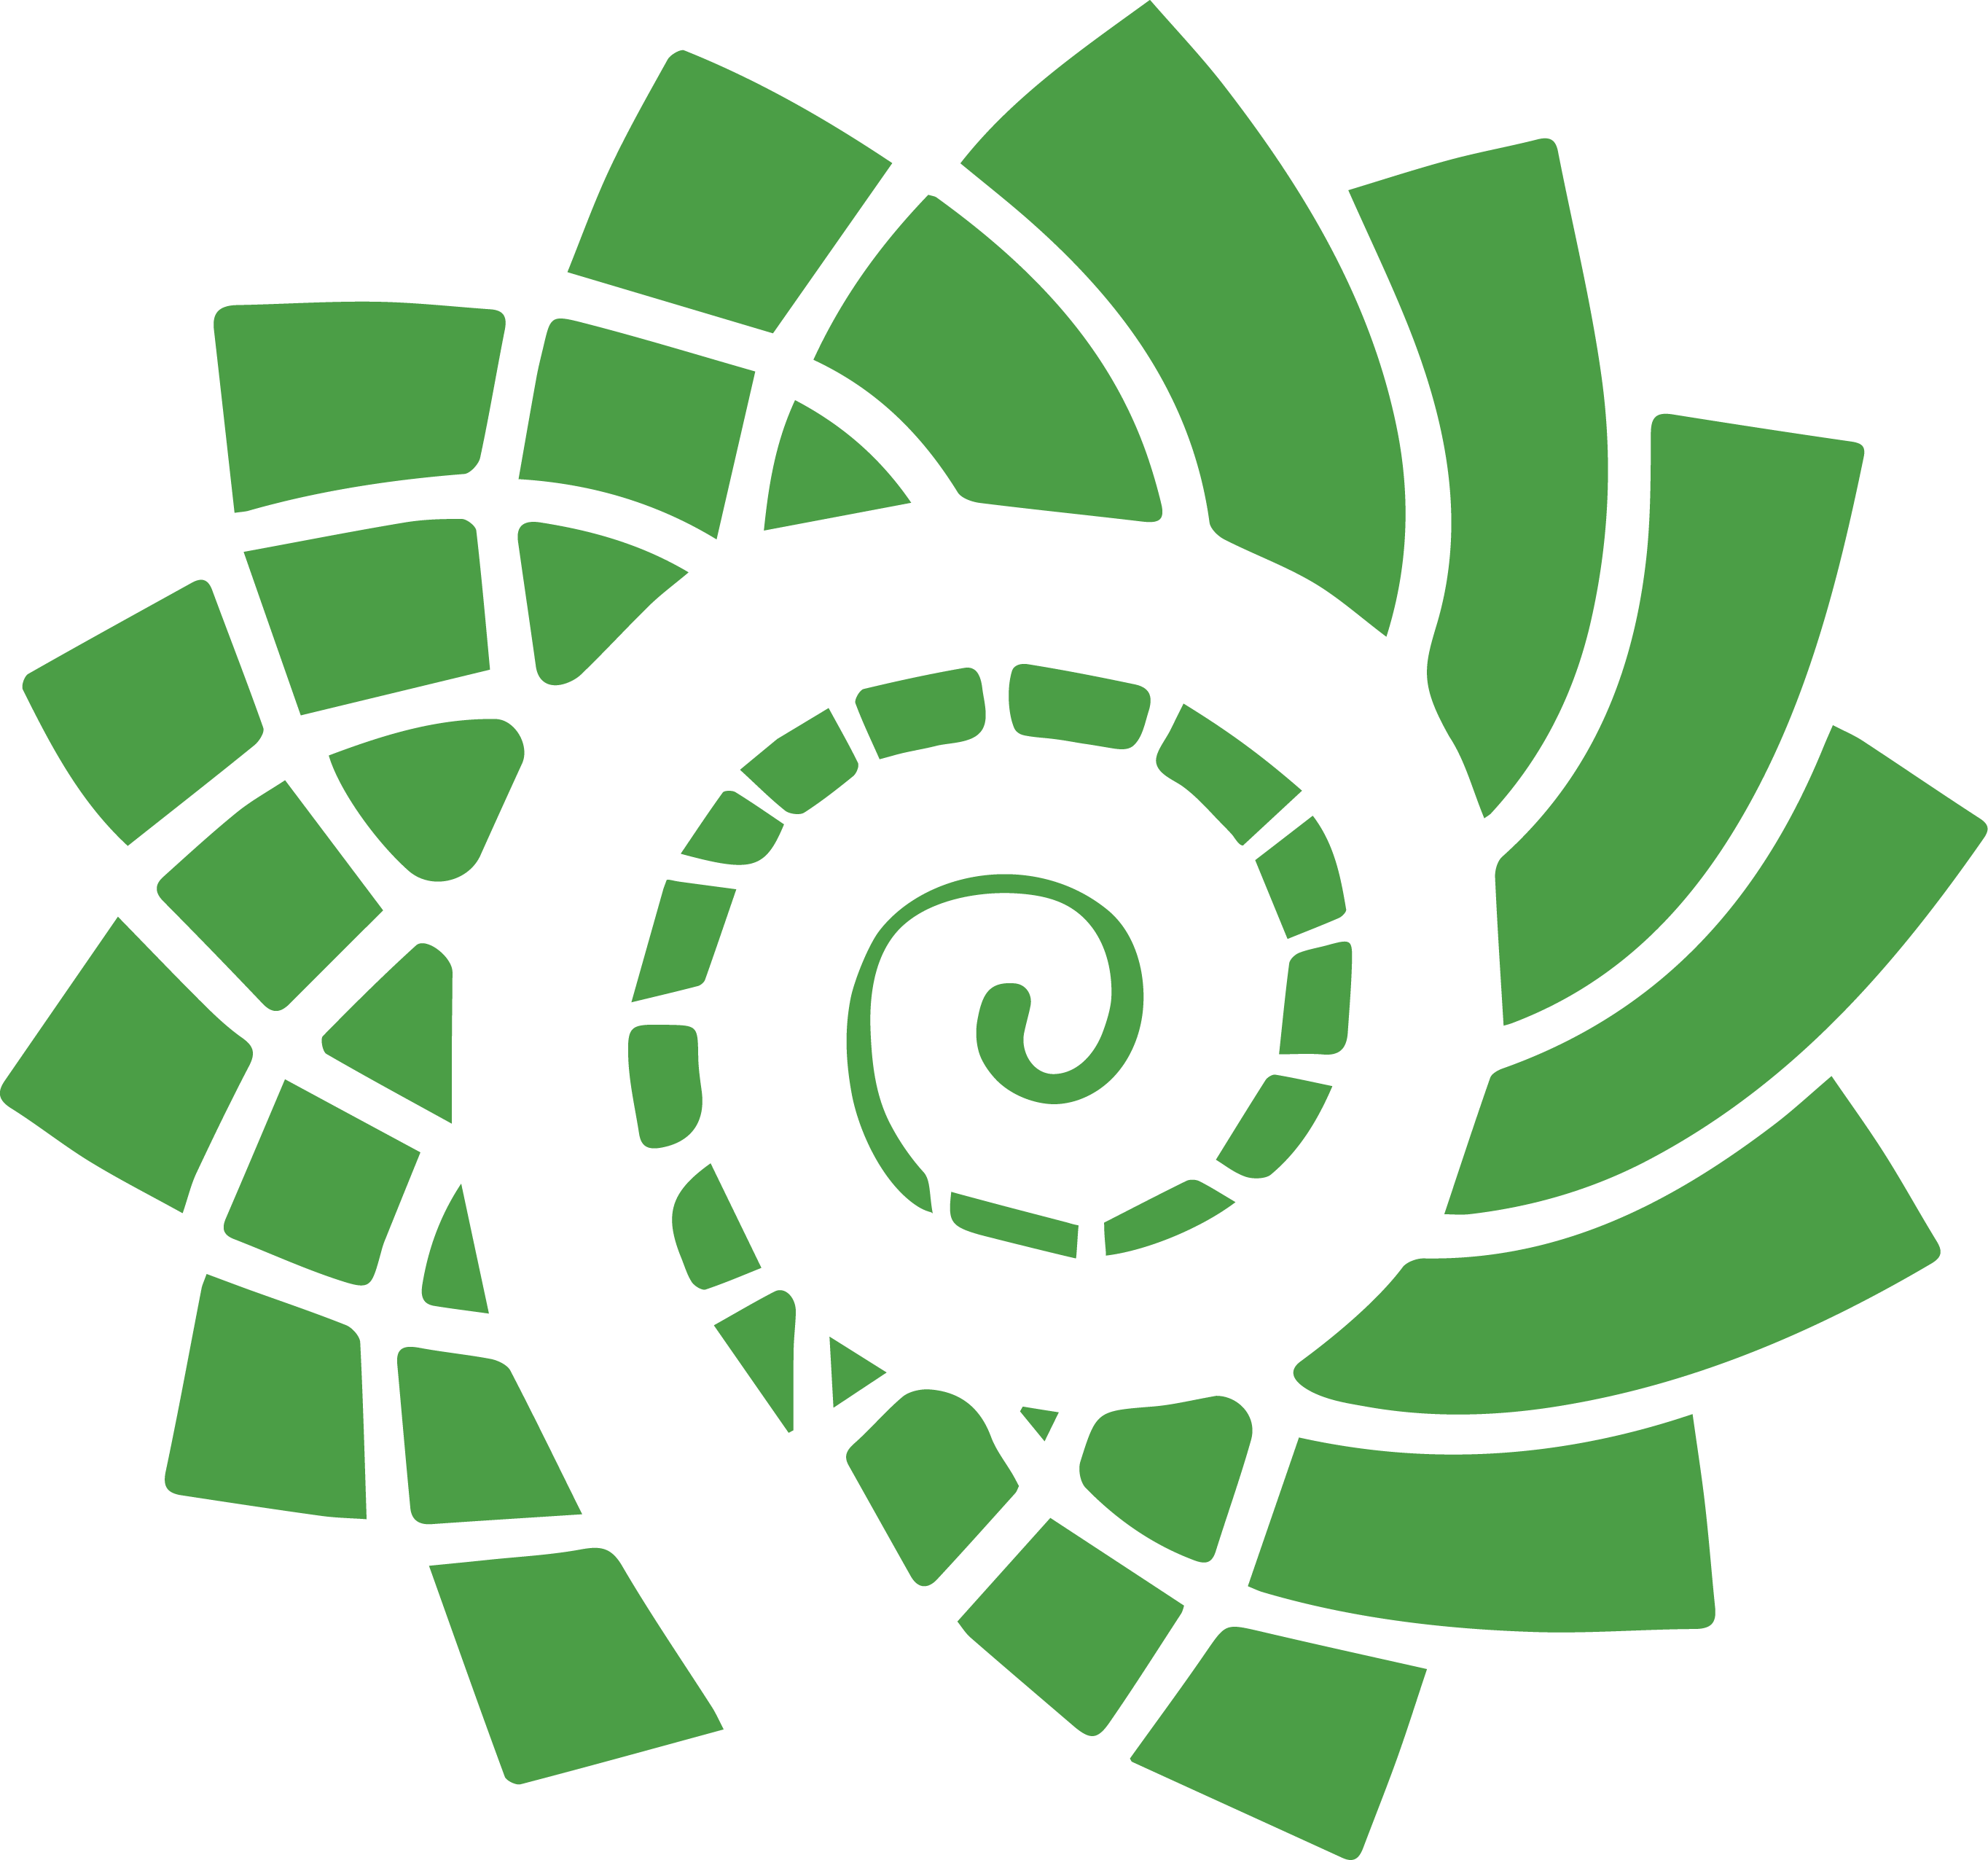 Parti Vert NB Green Party